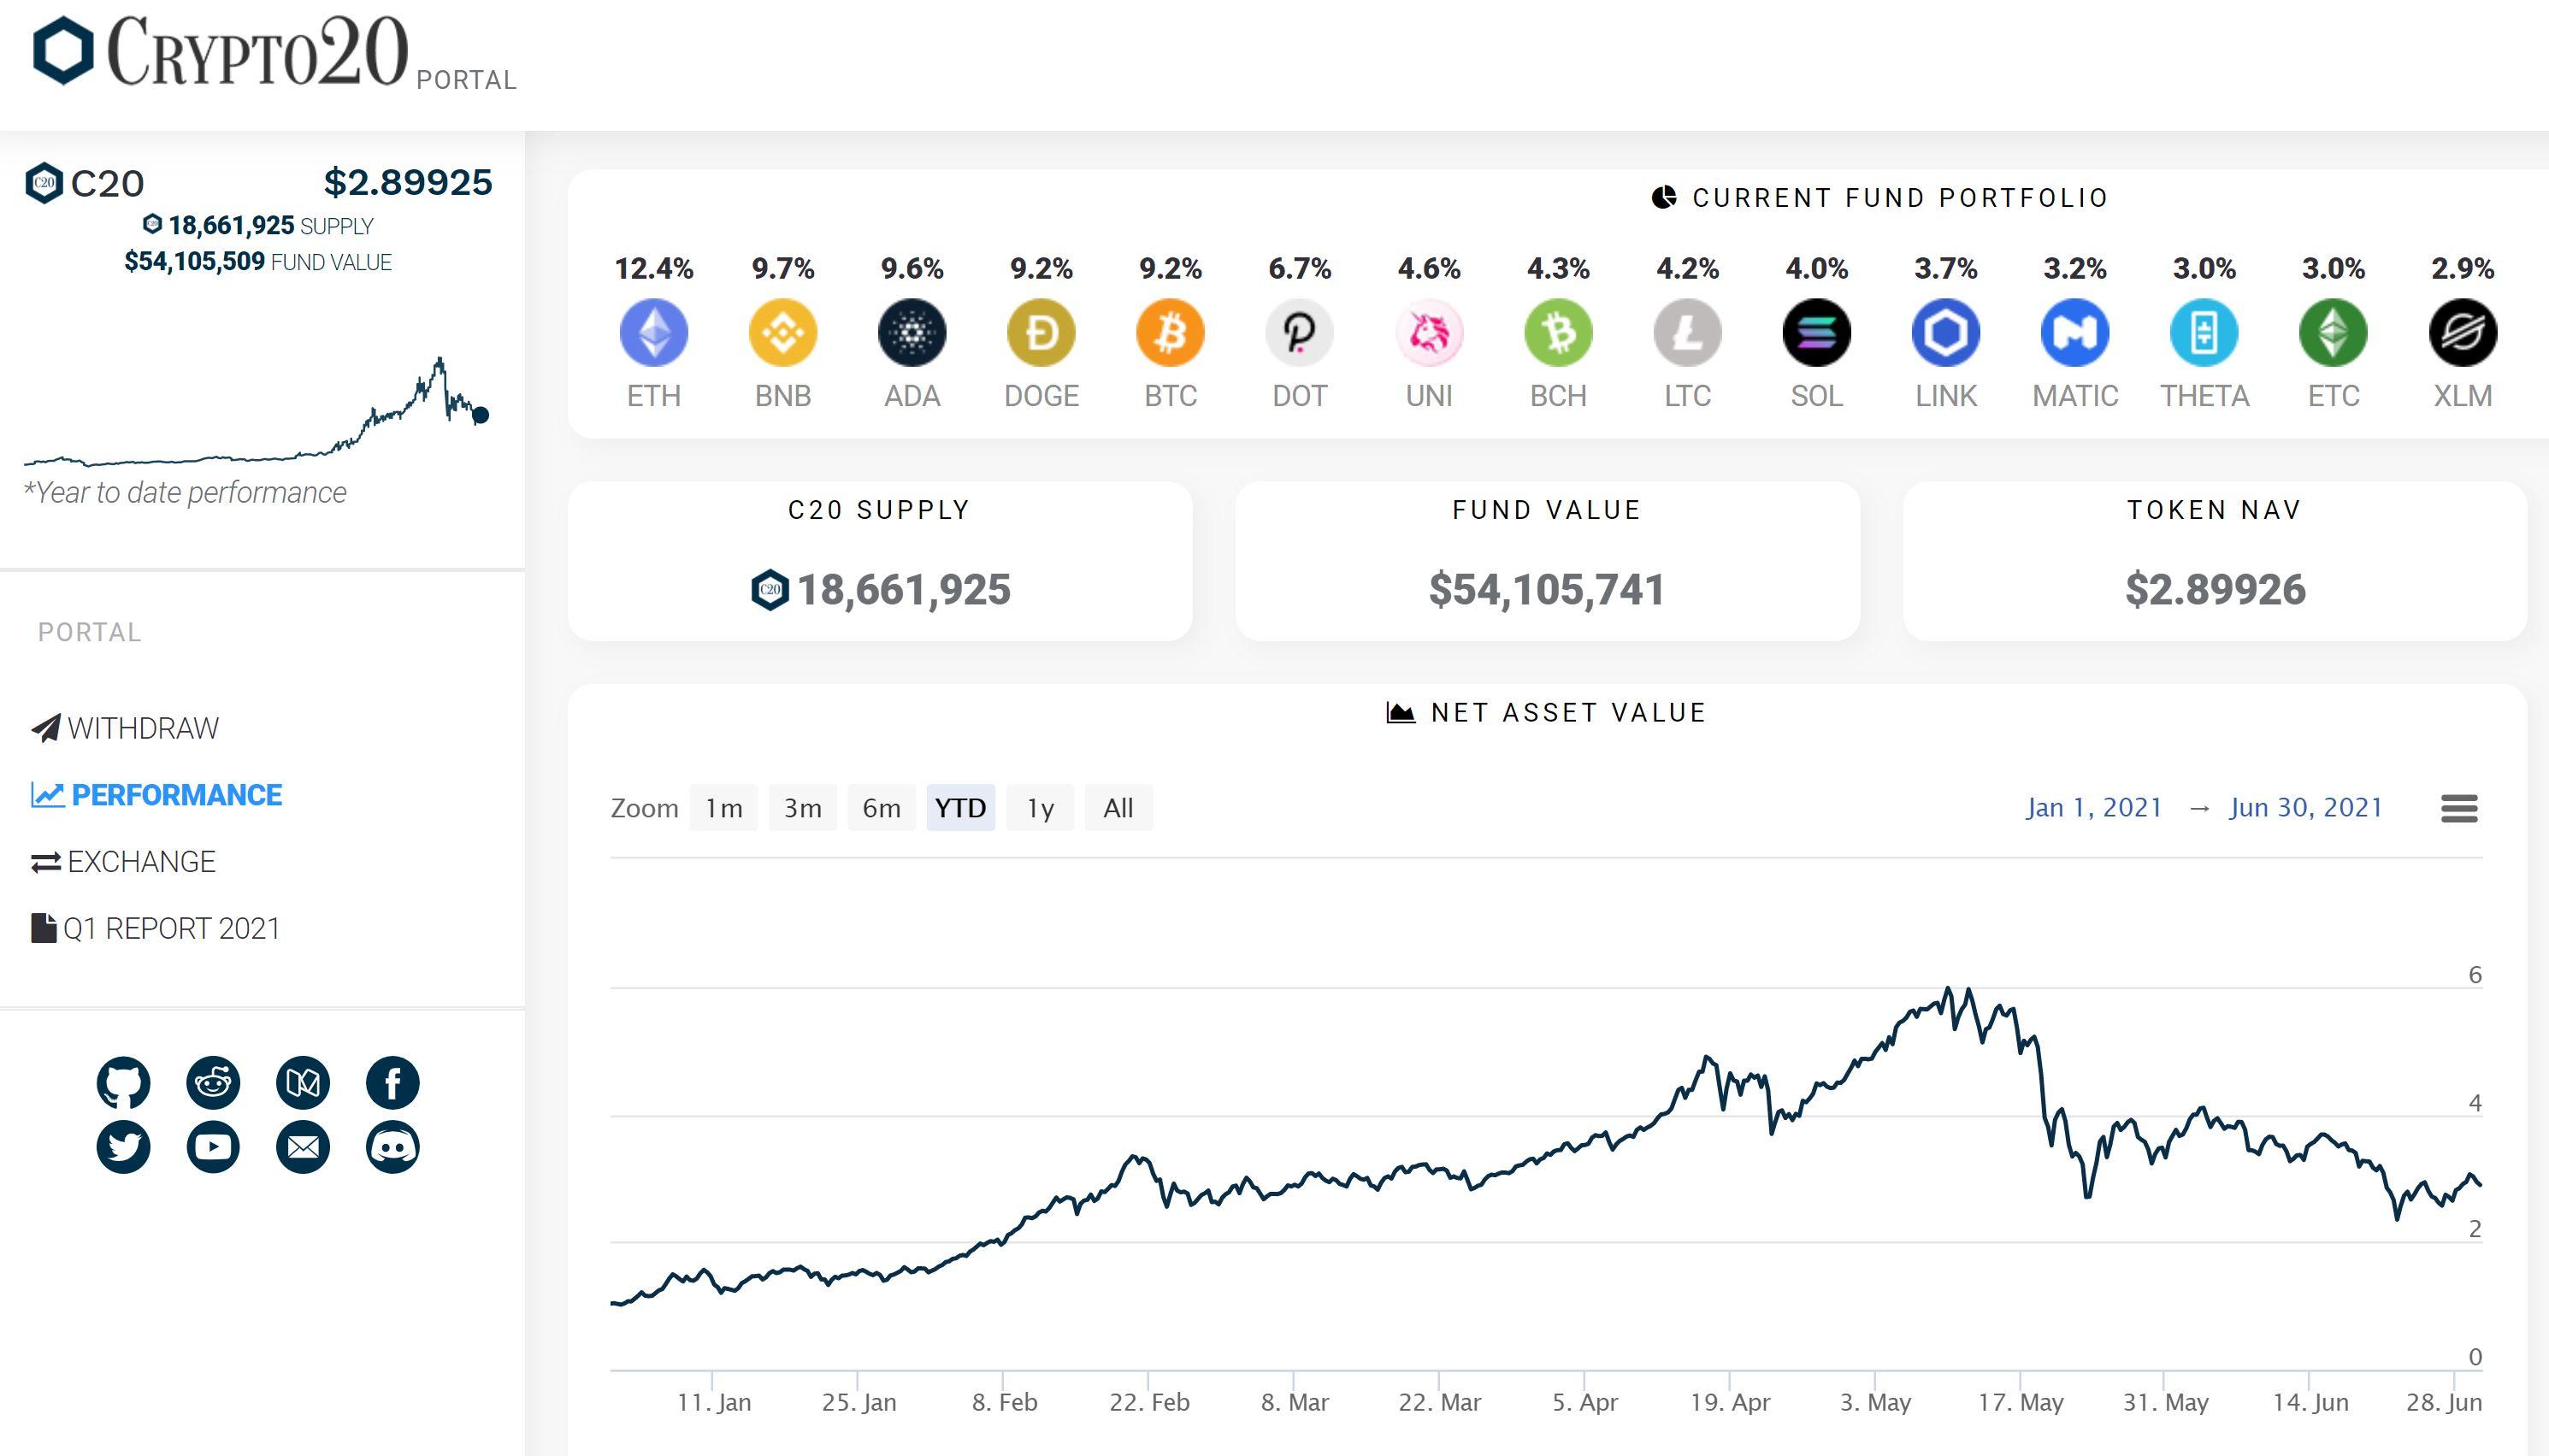 Crypto 20 Fond Performance